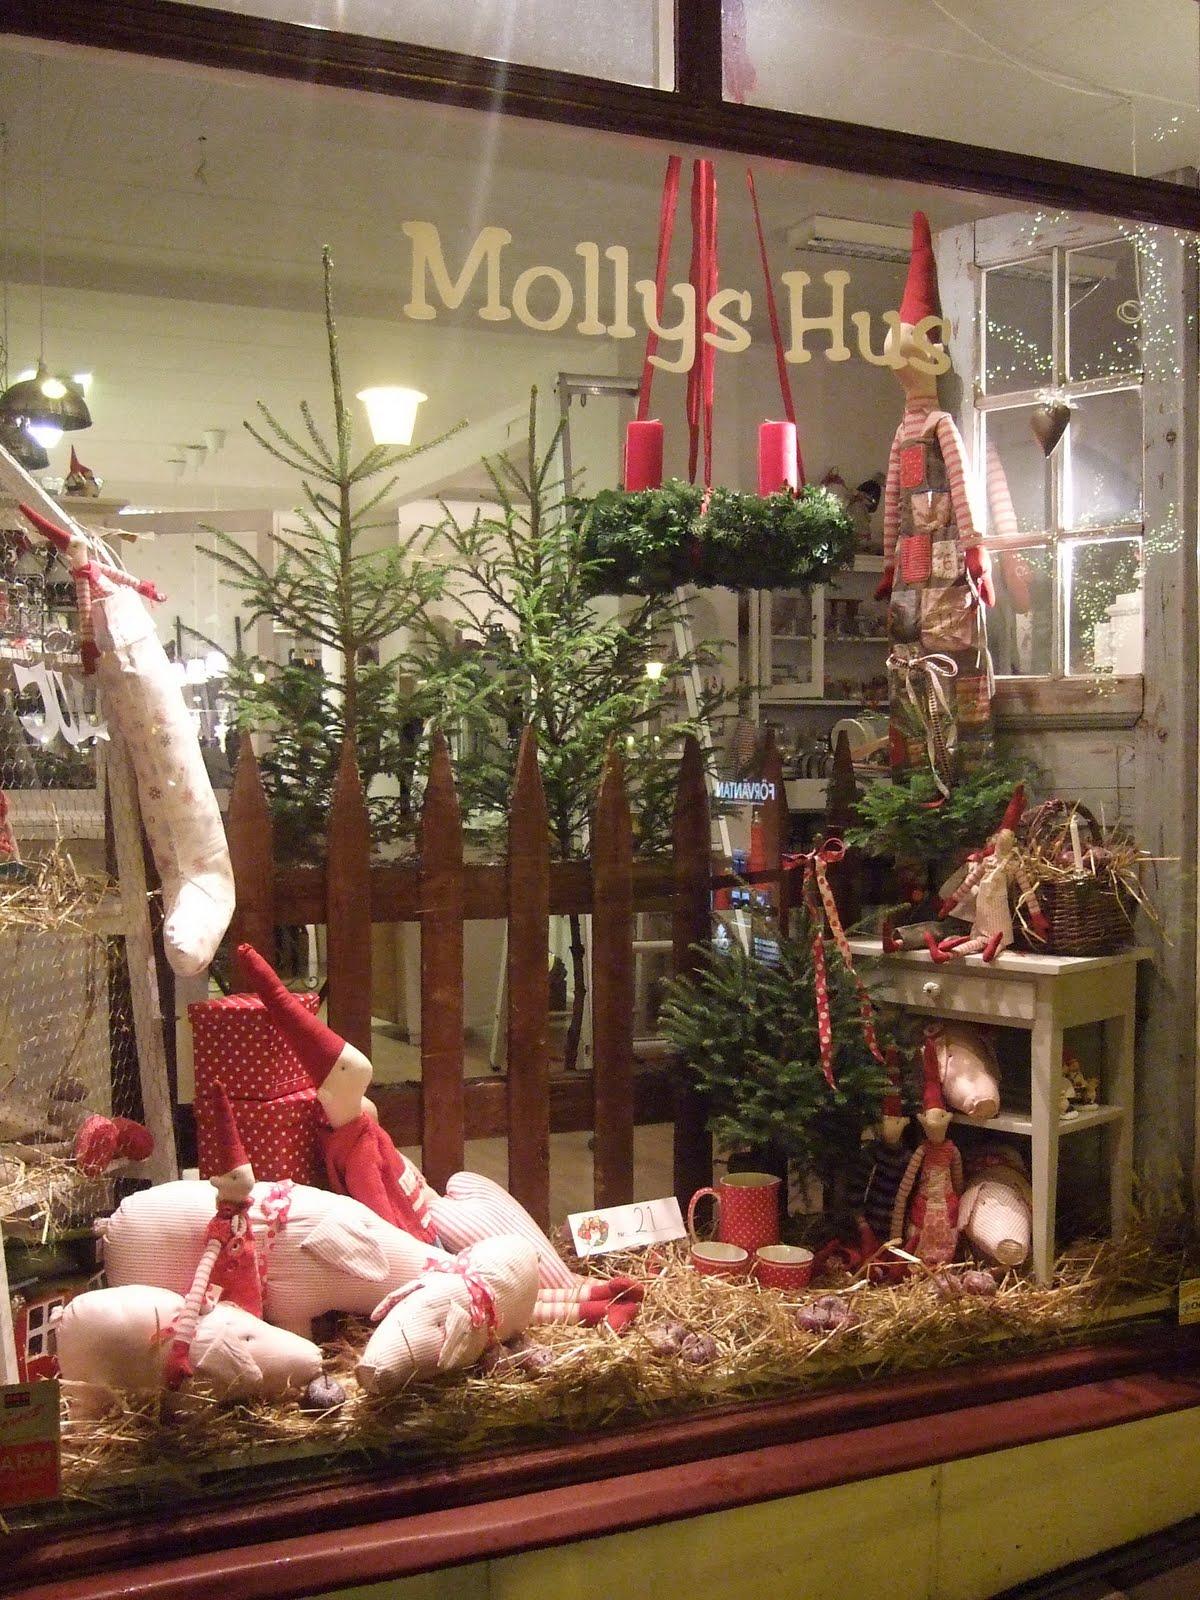 Mollys hus: november 2009